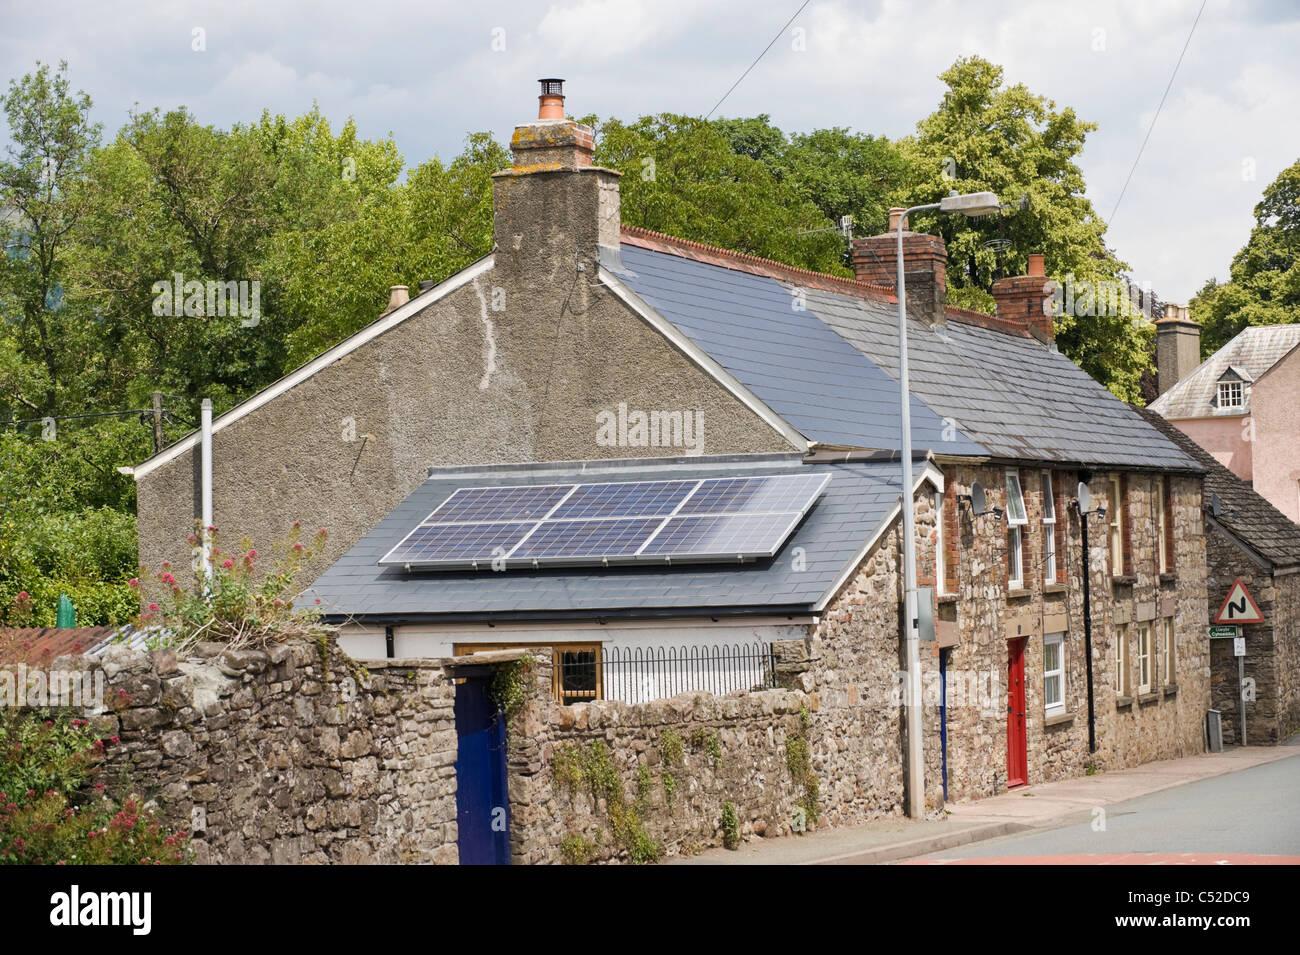 Solar Panels On Houses In Stock Photos Amp Solar Panels On